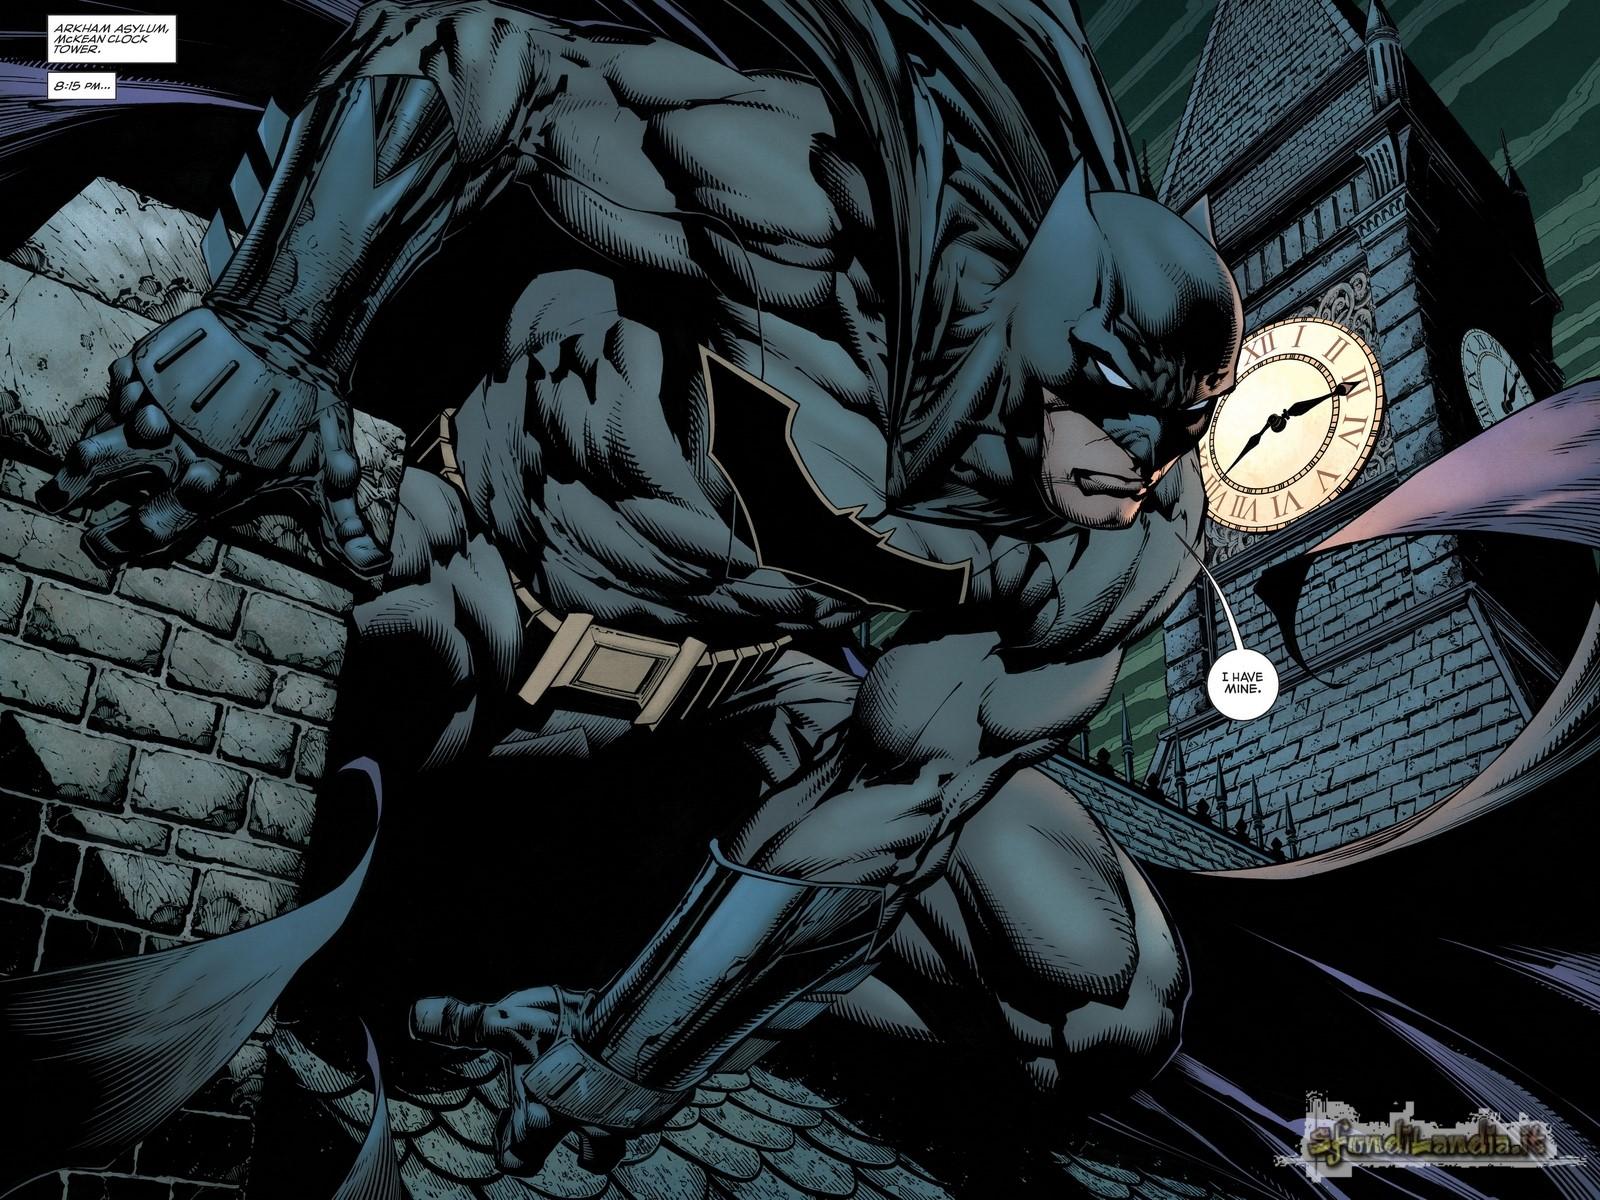 Batman In The Night